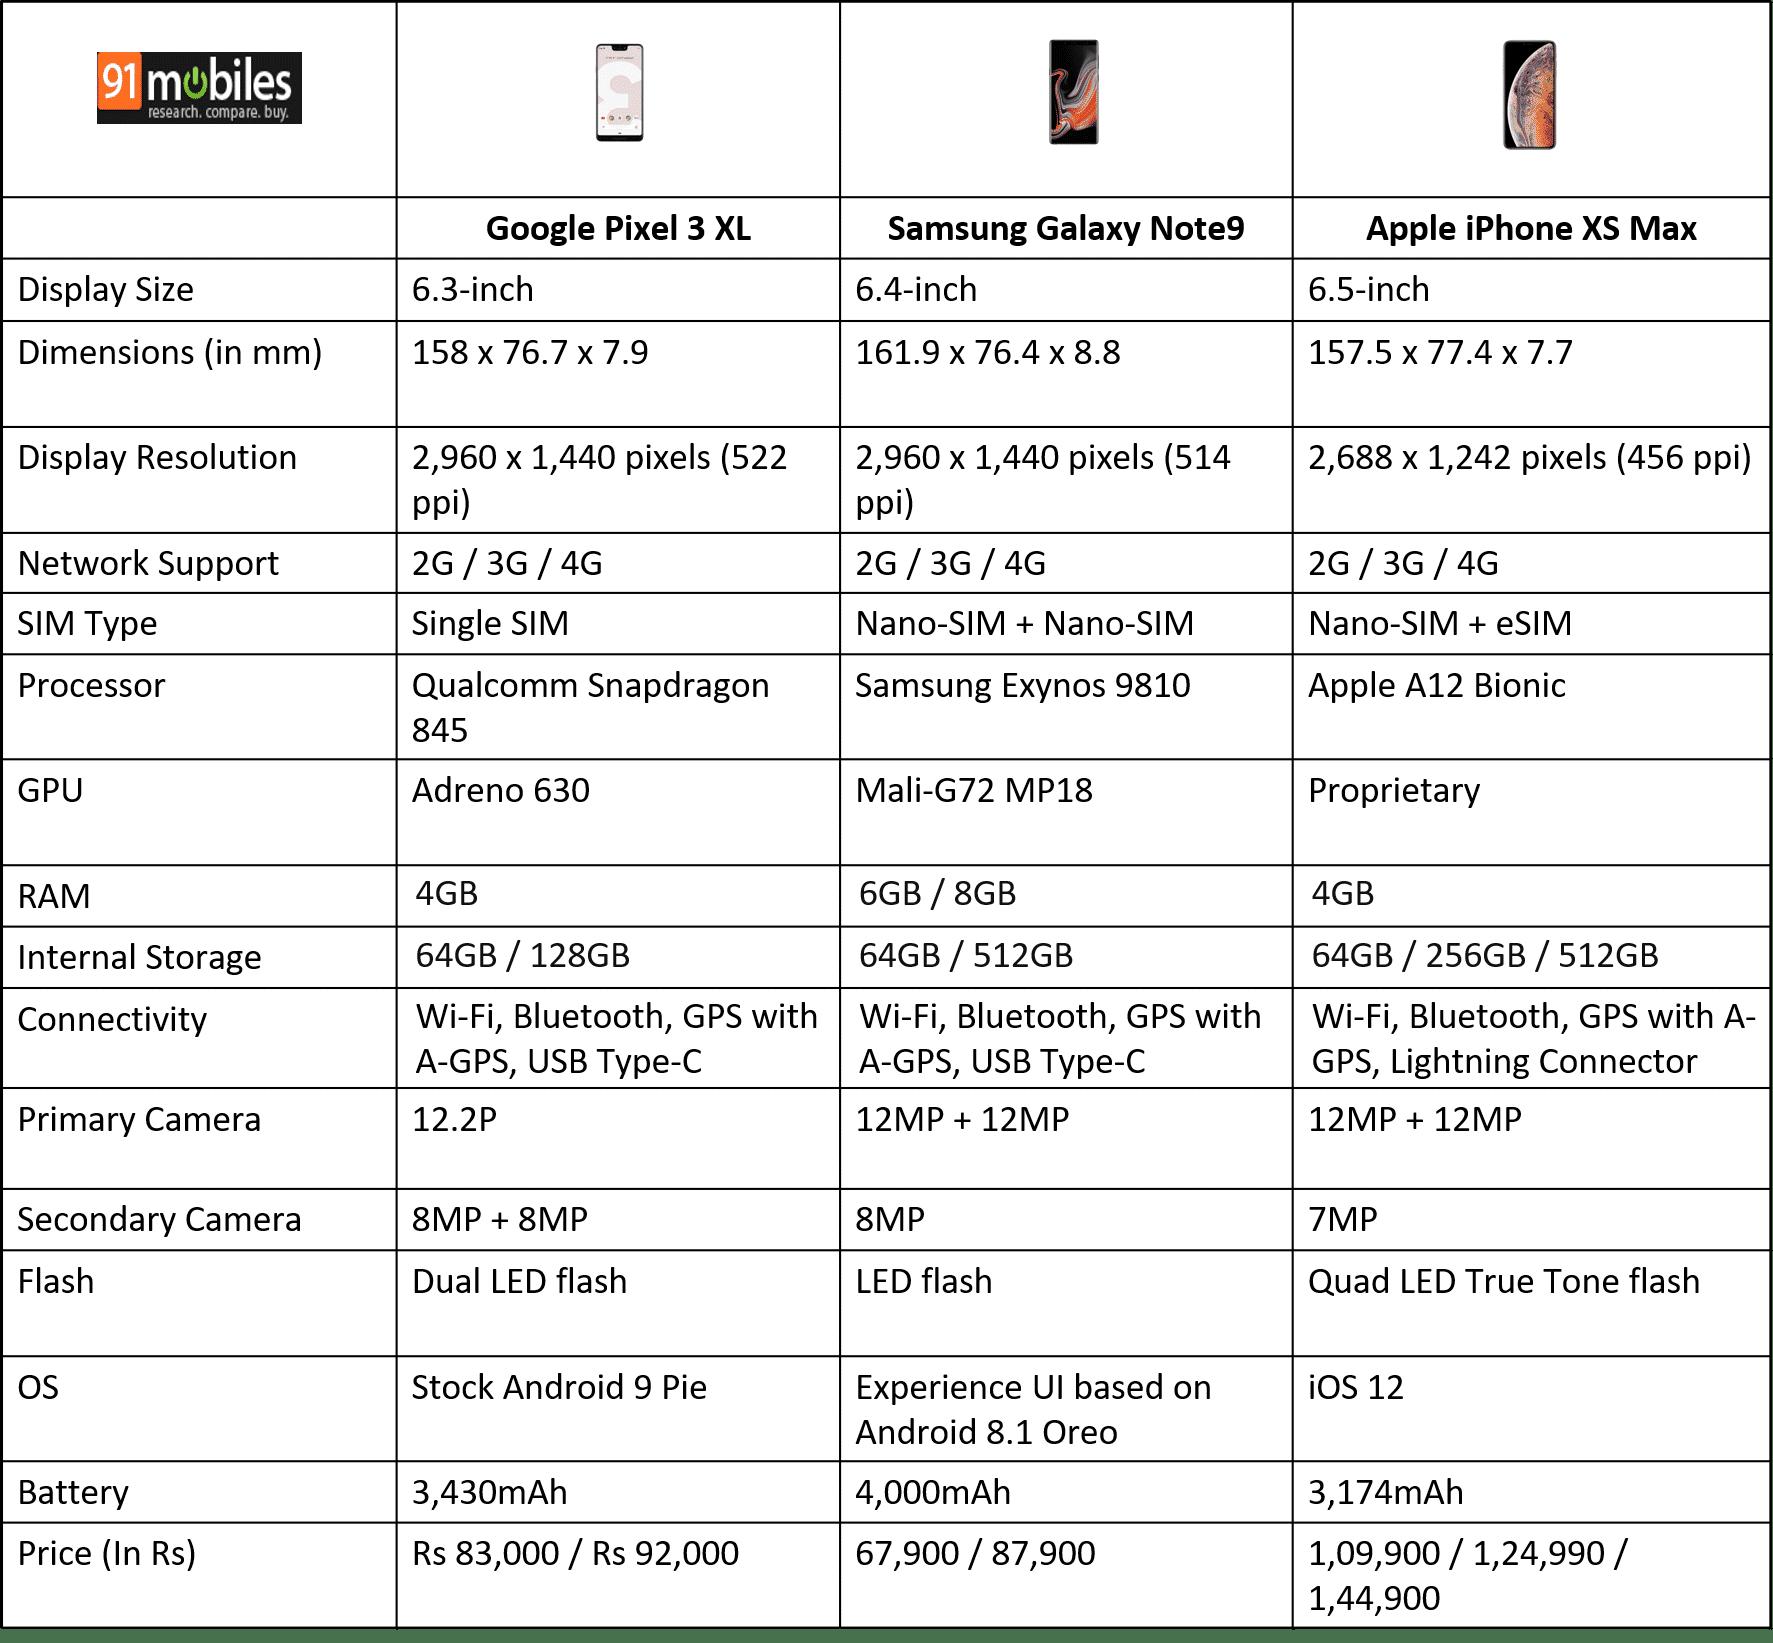 Google Pixel 3 XL vs Apple iPhone XS Max vs Samsung Galaxy Note9